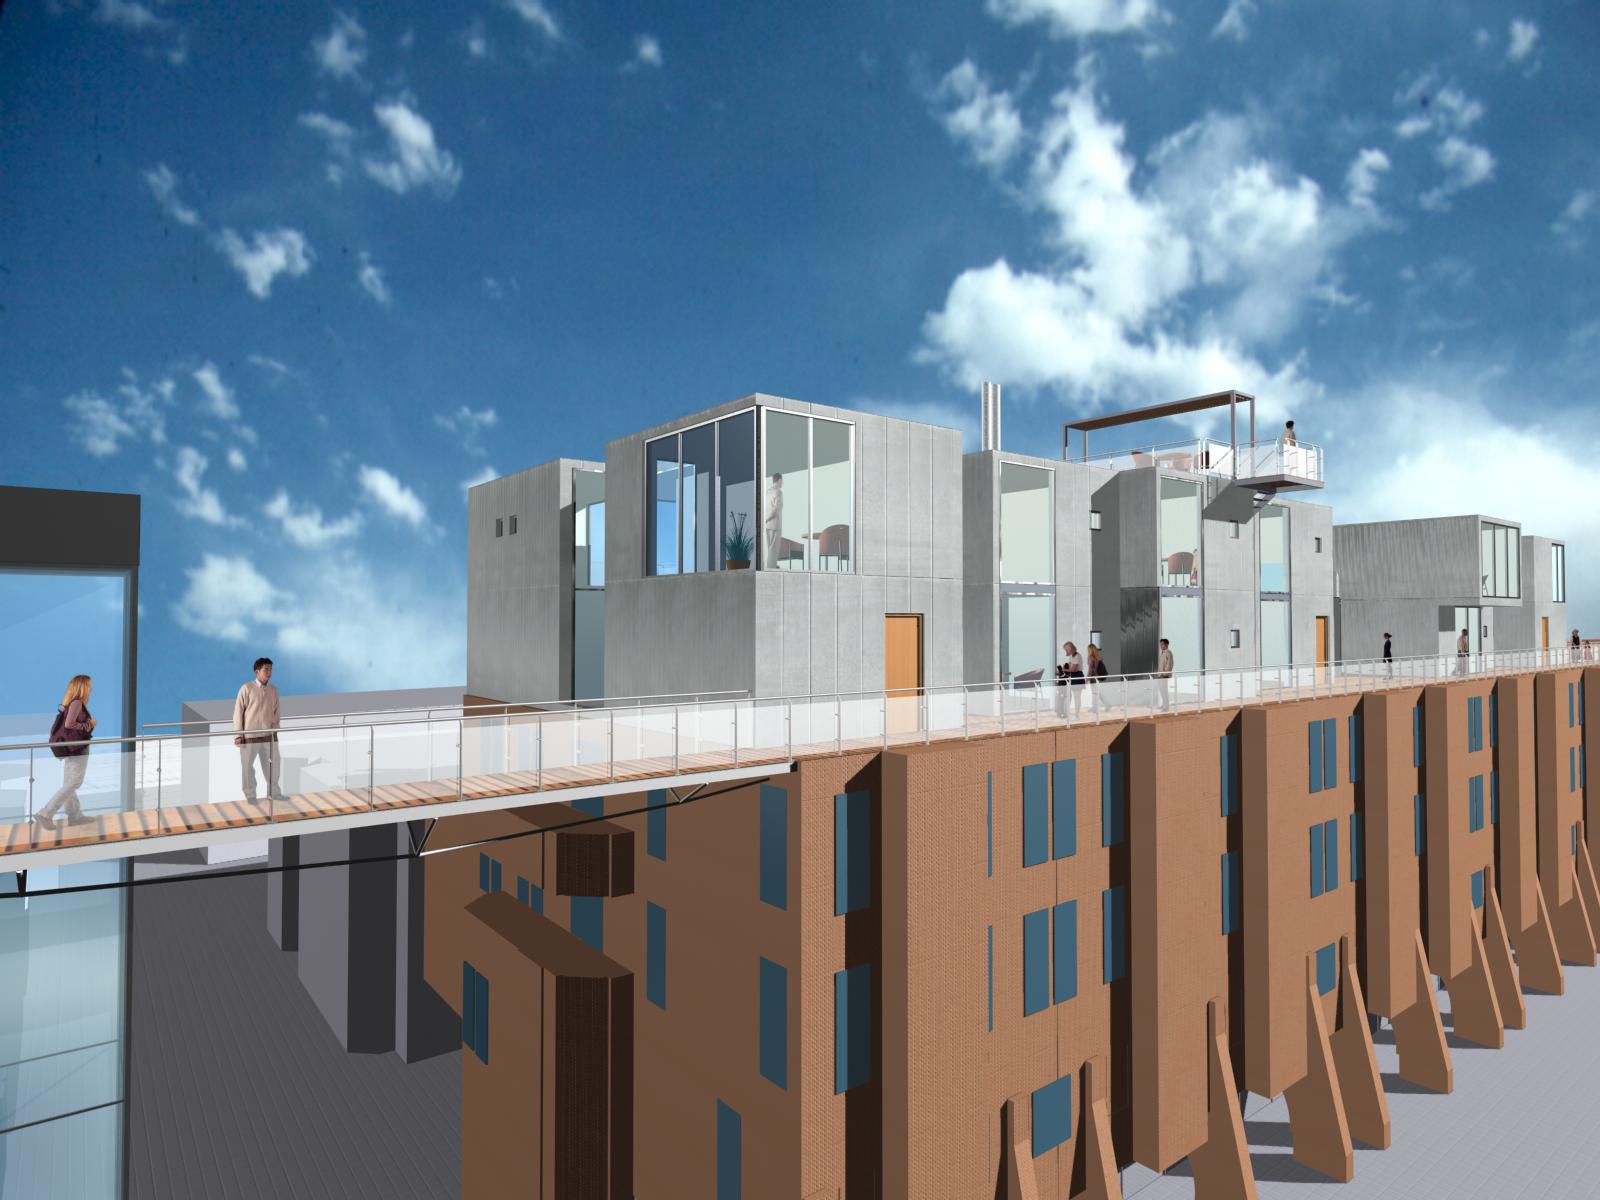 Architectenbureau Den Haag : Boogjes rotterdam archipelontwerpers architectenbureau den haag